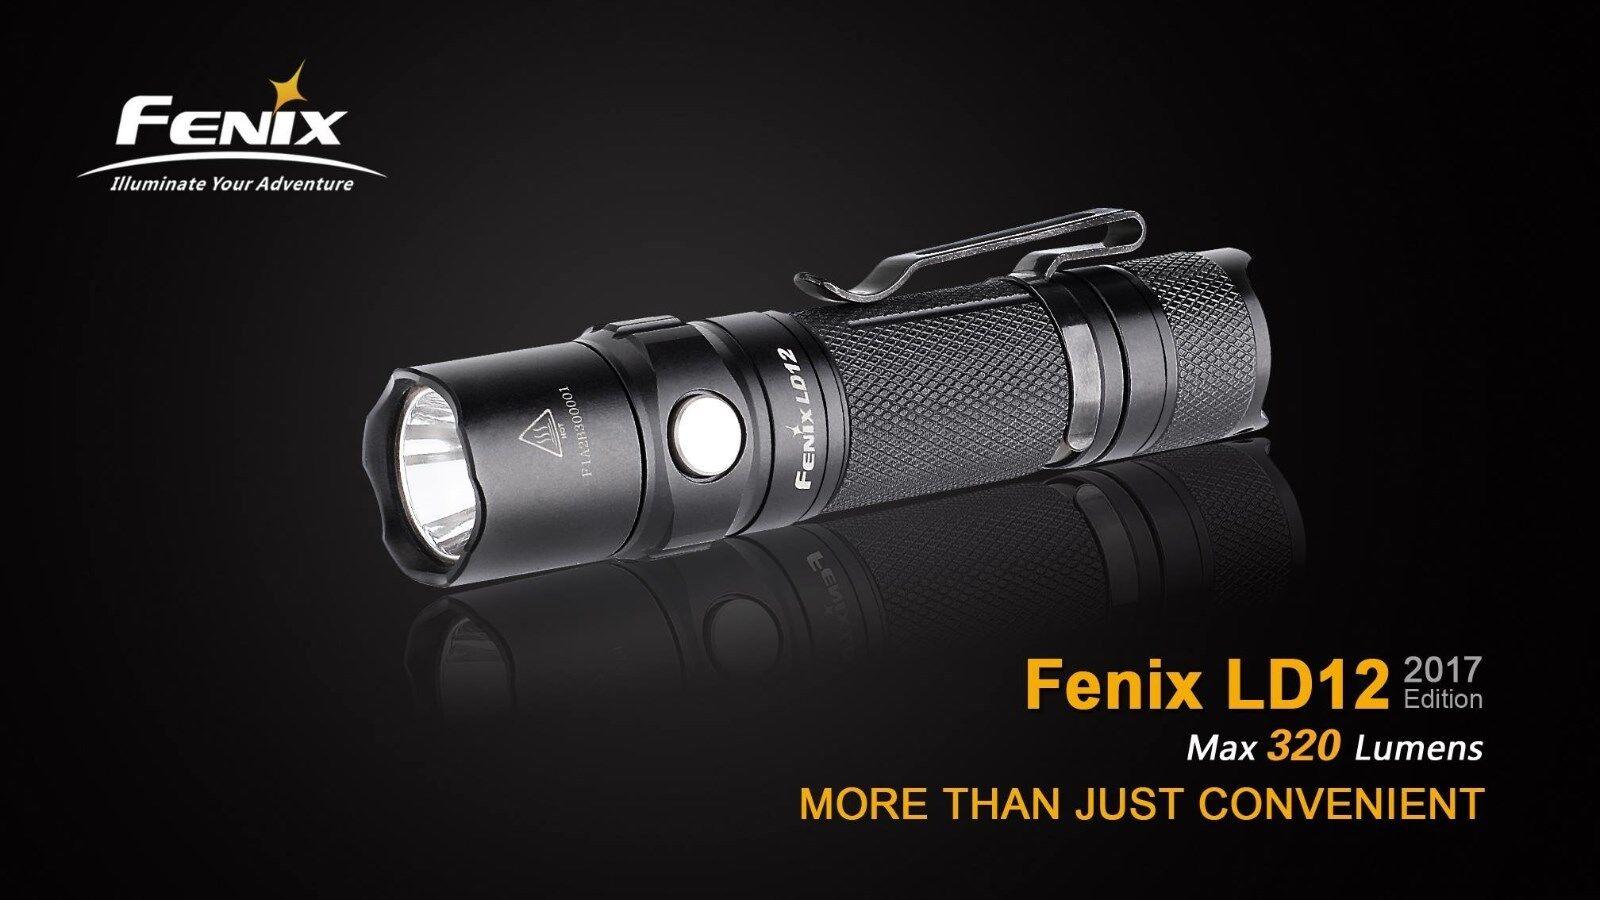 Fenix ld12 DEL Lampe de poche 2017 Edition avec avec avec 320 lm 95a83f